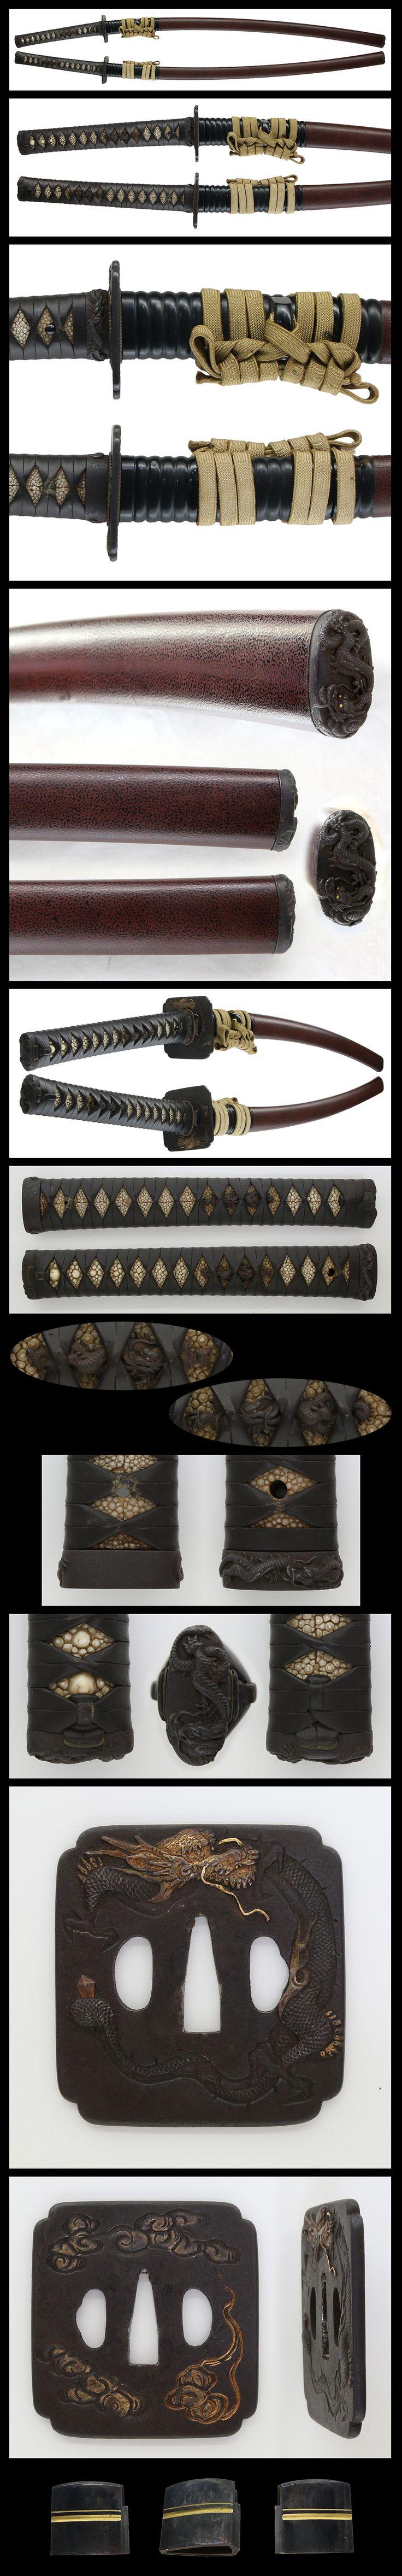 Katana: Mumei (Nakayama Yoshimichi) | Japanese Sword Shop Aoi-Art.